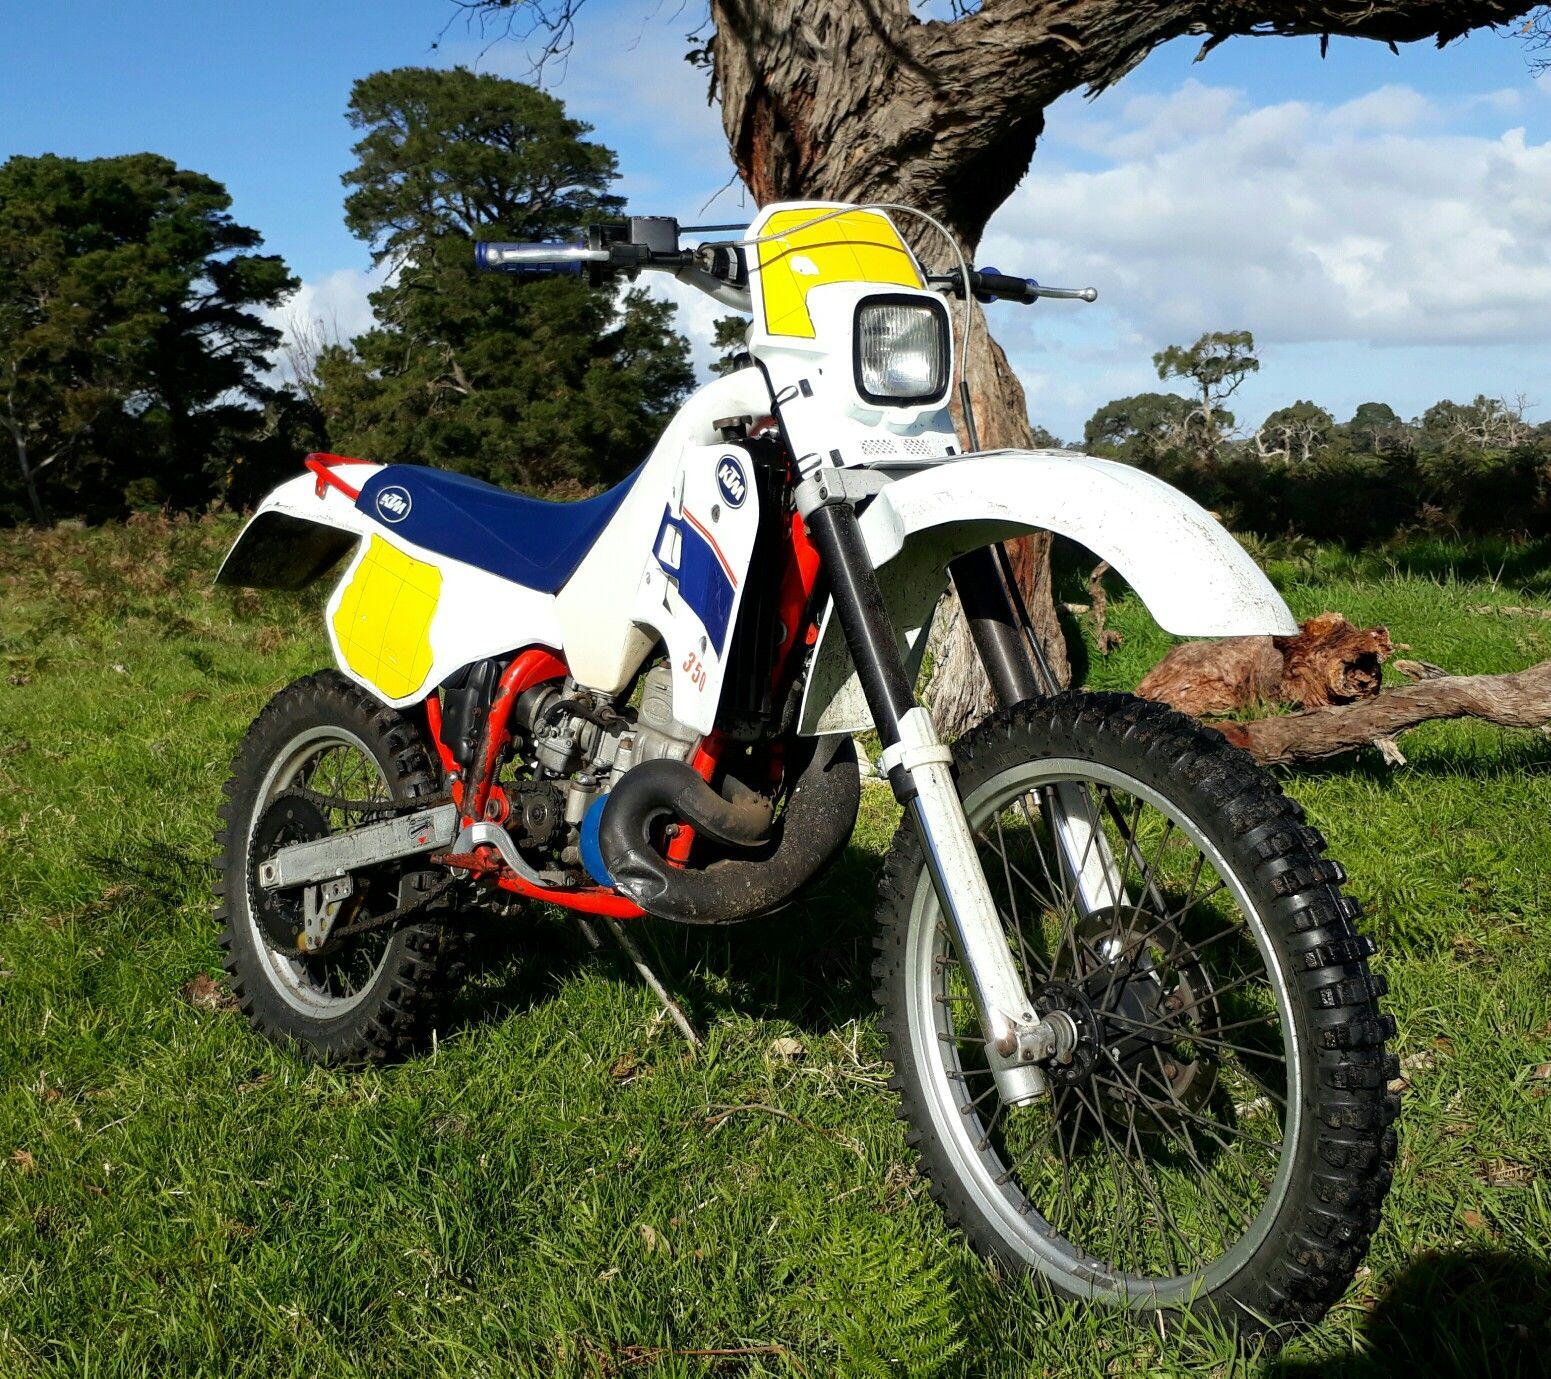 Ktm 350 2 Stroke 1988 Vinduro Enduro Motorcycle Classic Motorcycles Adventure Bike